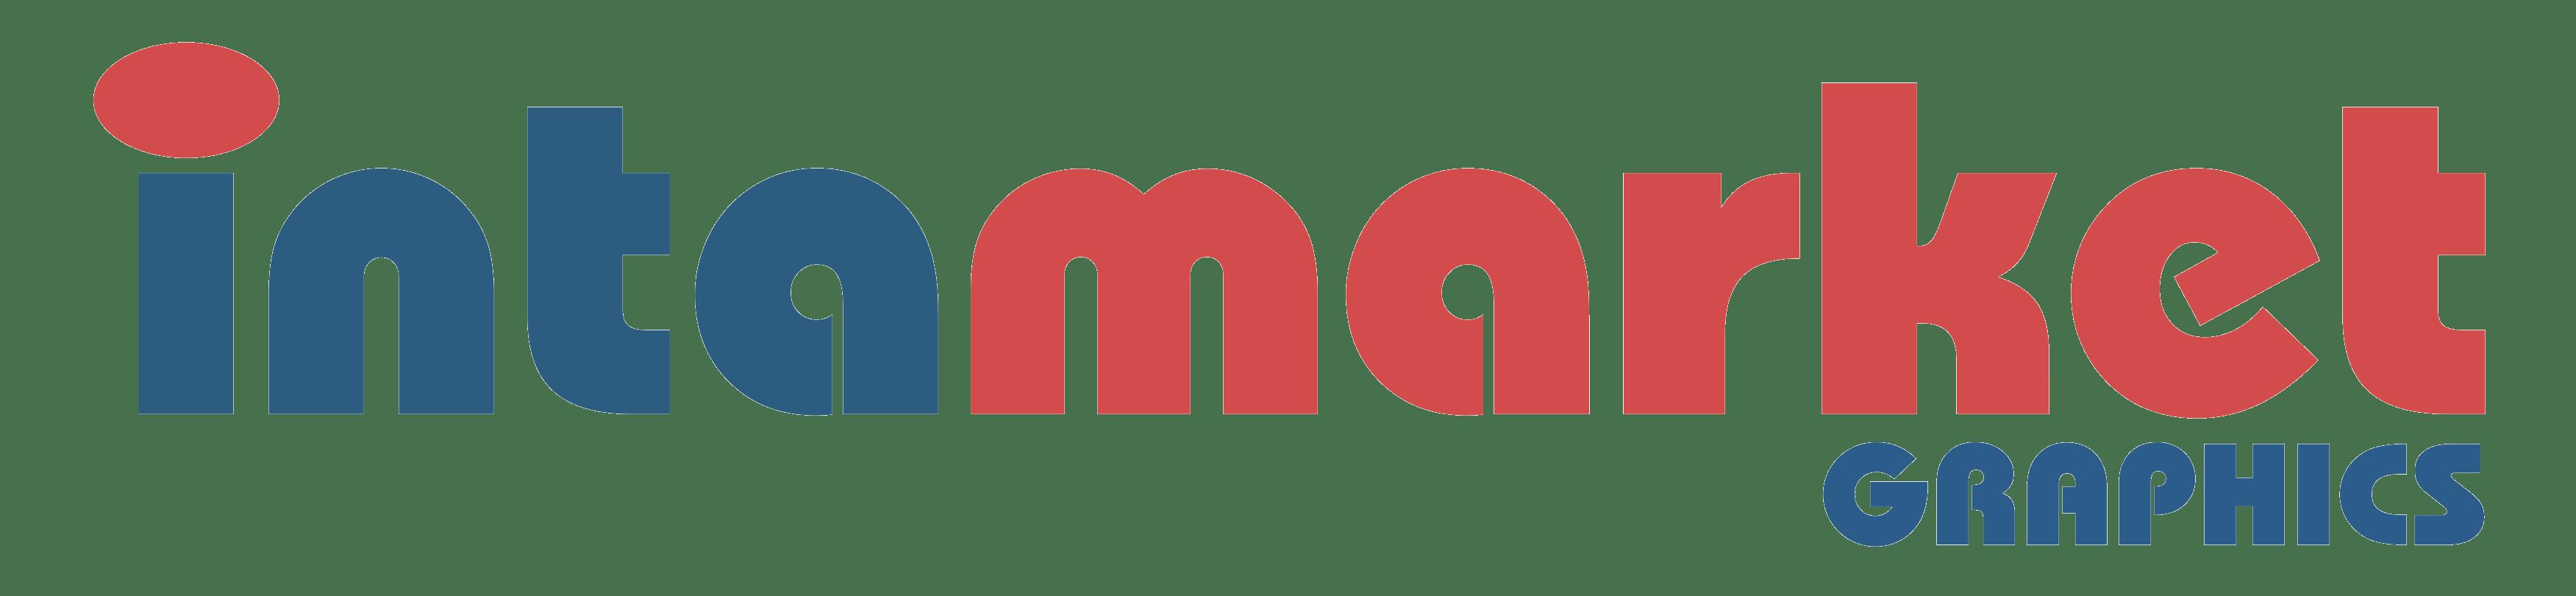 Intamarket Graphics logo